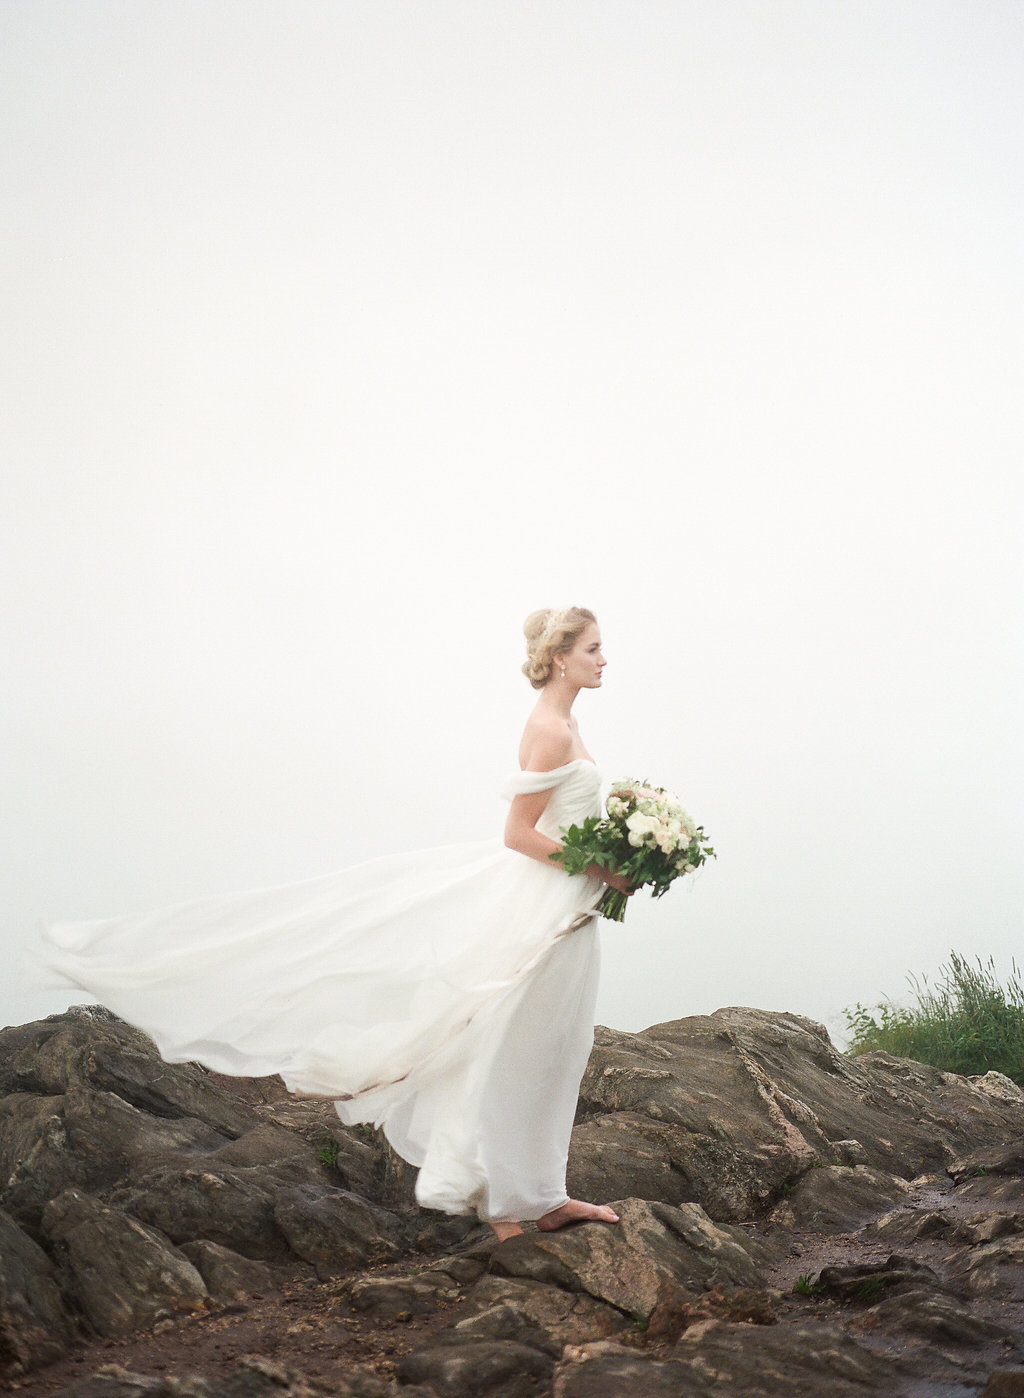 josie-photographs-urban-petals-mountain-wedding-north-carolina-mountain-wedding-ivory-and-beau-bridal-boutique-savannah-wedding-dresses-savannah-bridal-boutique-savannah-wedding-gowns-sarah-seven-lafayette-sarah-seven-wedding-dress-boho-bride-26.jpg